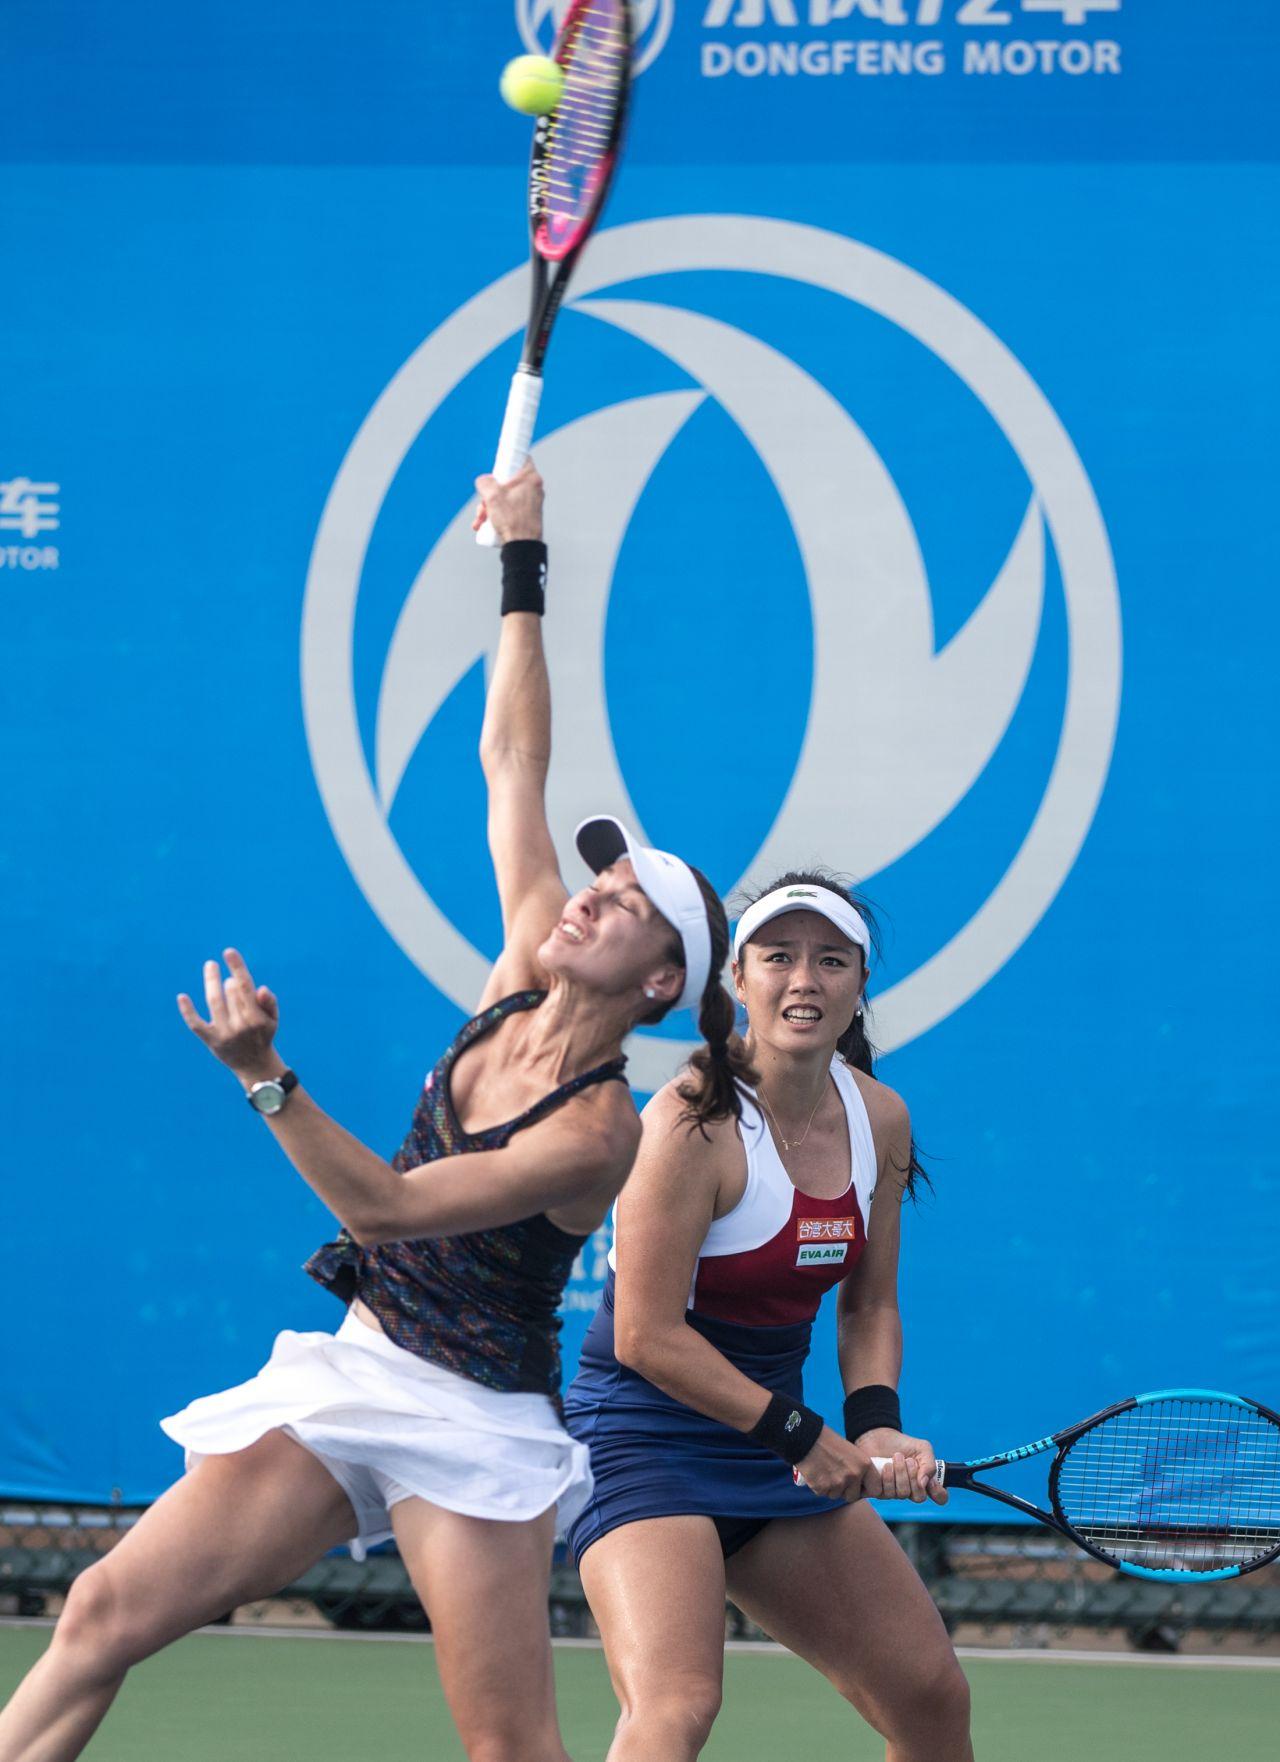 Hingis 2017 WTA Wuhan Open in Wuhan 09 26 2017